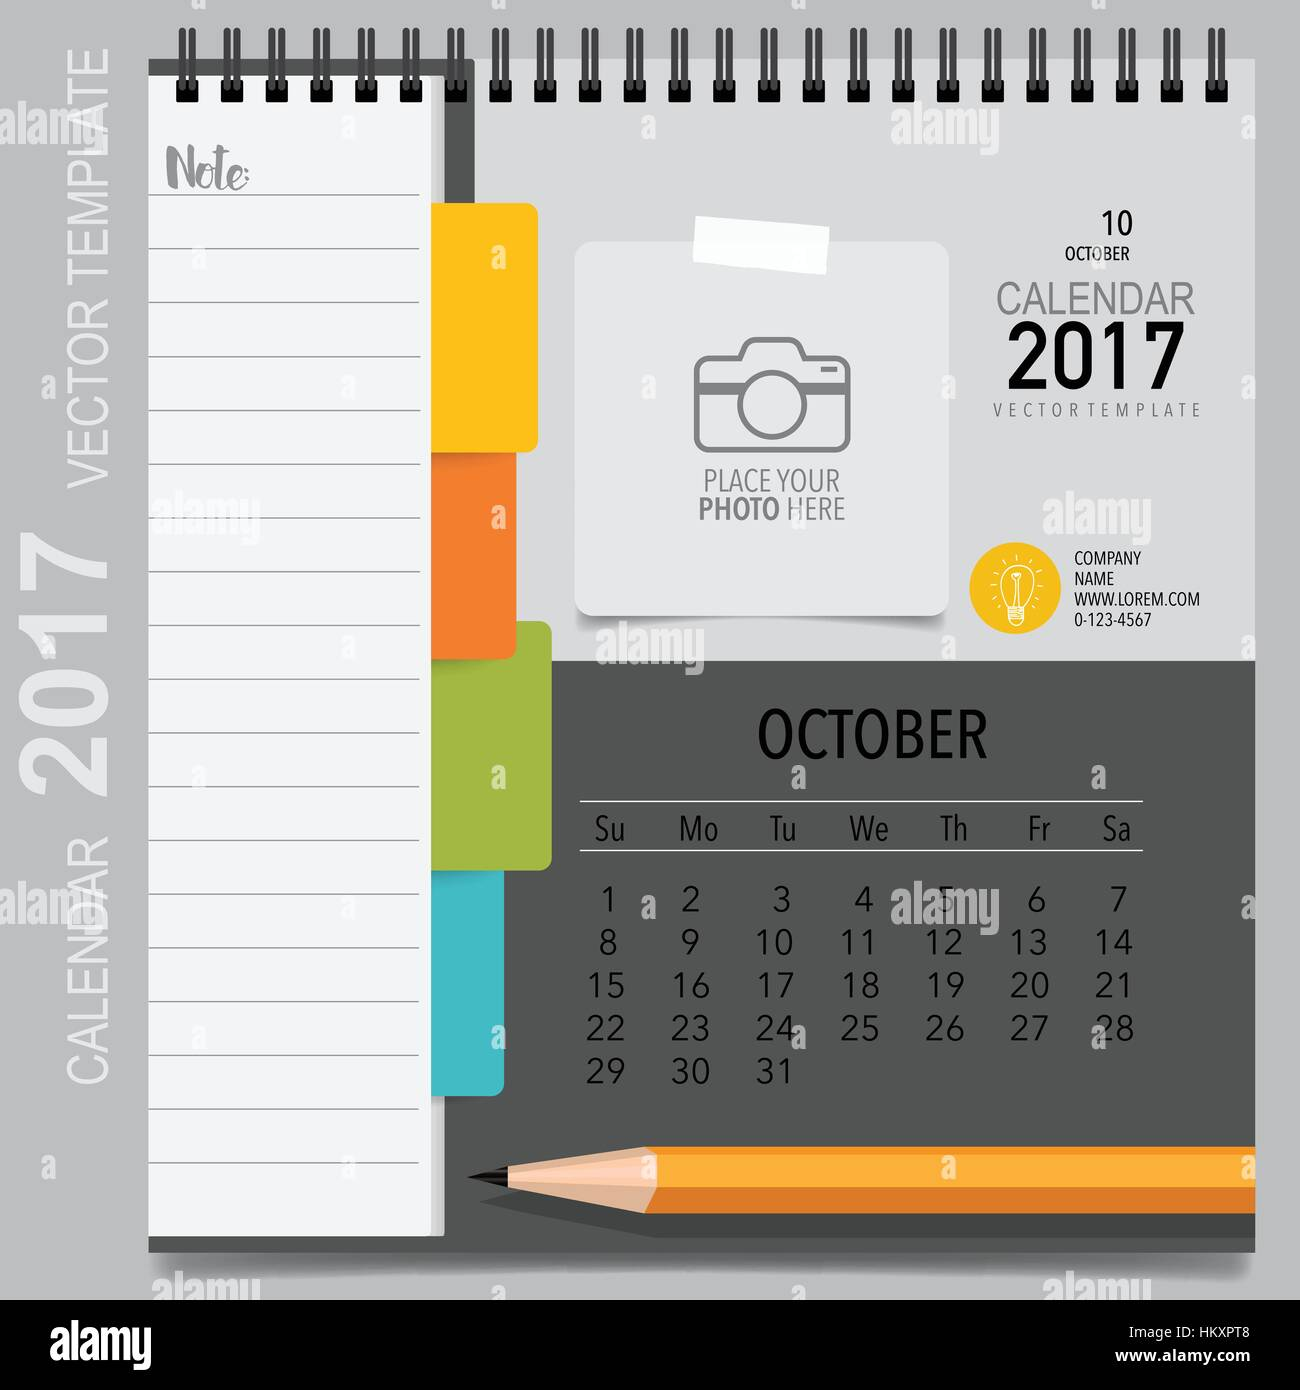 2017 Calendar Planner Vector Design Monthly Calendar Template For